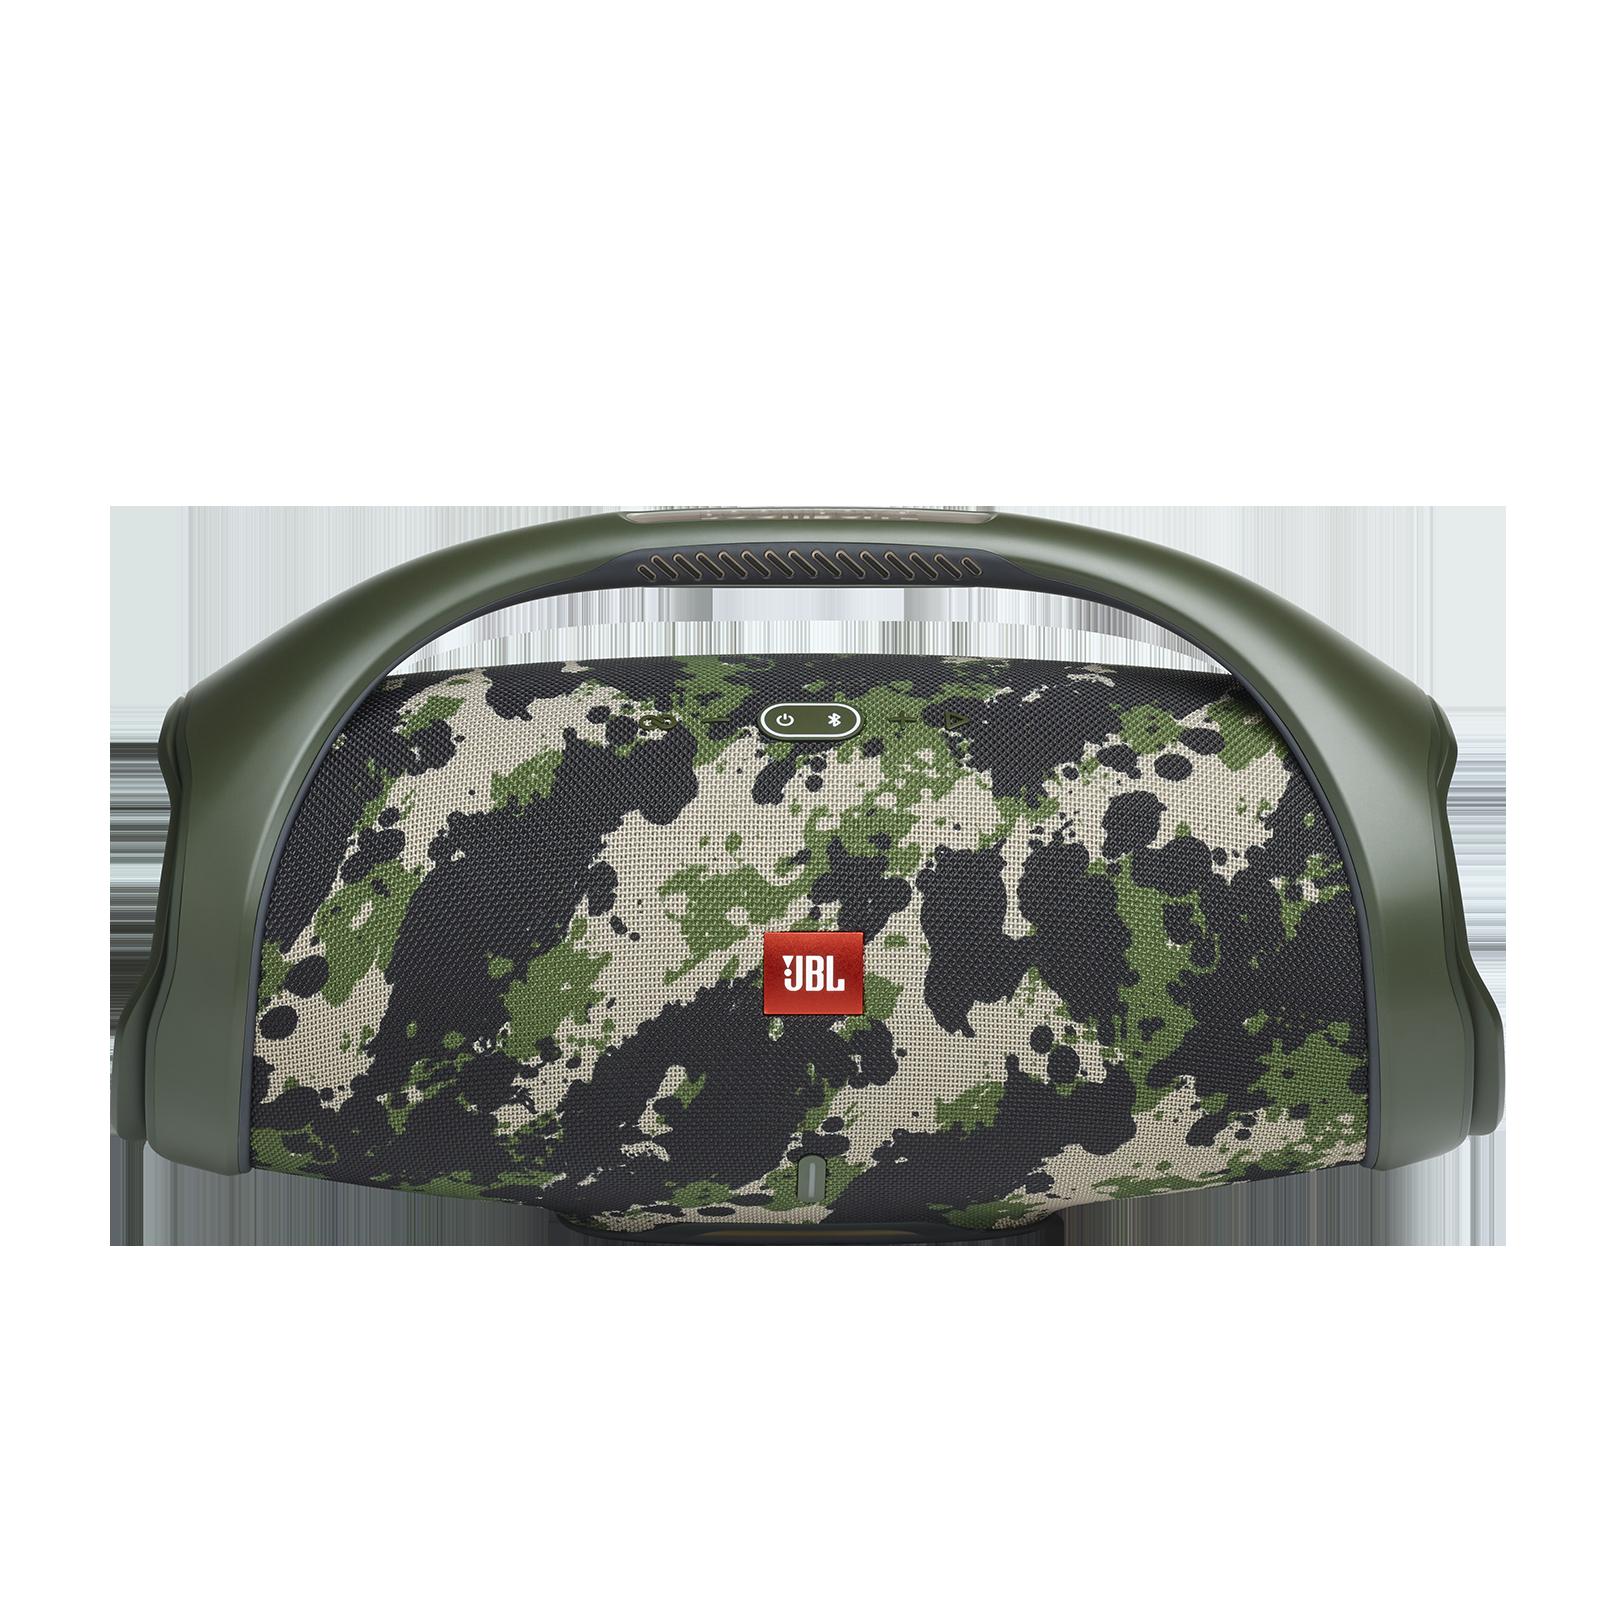 JBL Boombox 2 - Squad - Portable Bluetooth Speaker - Front